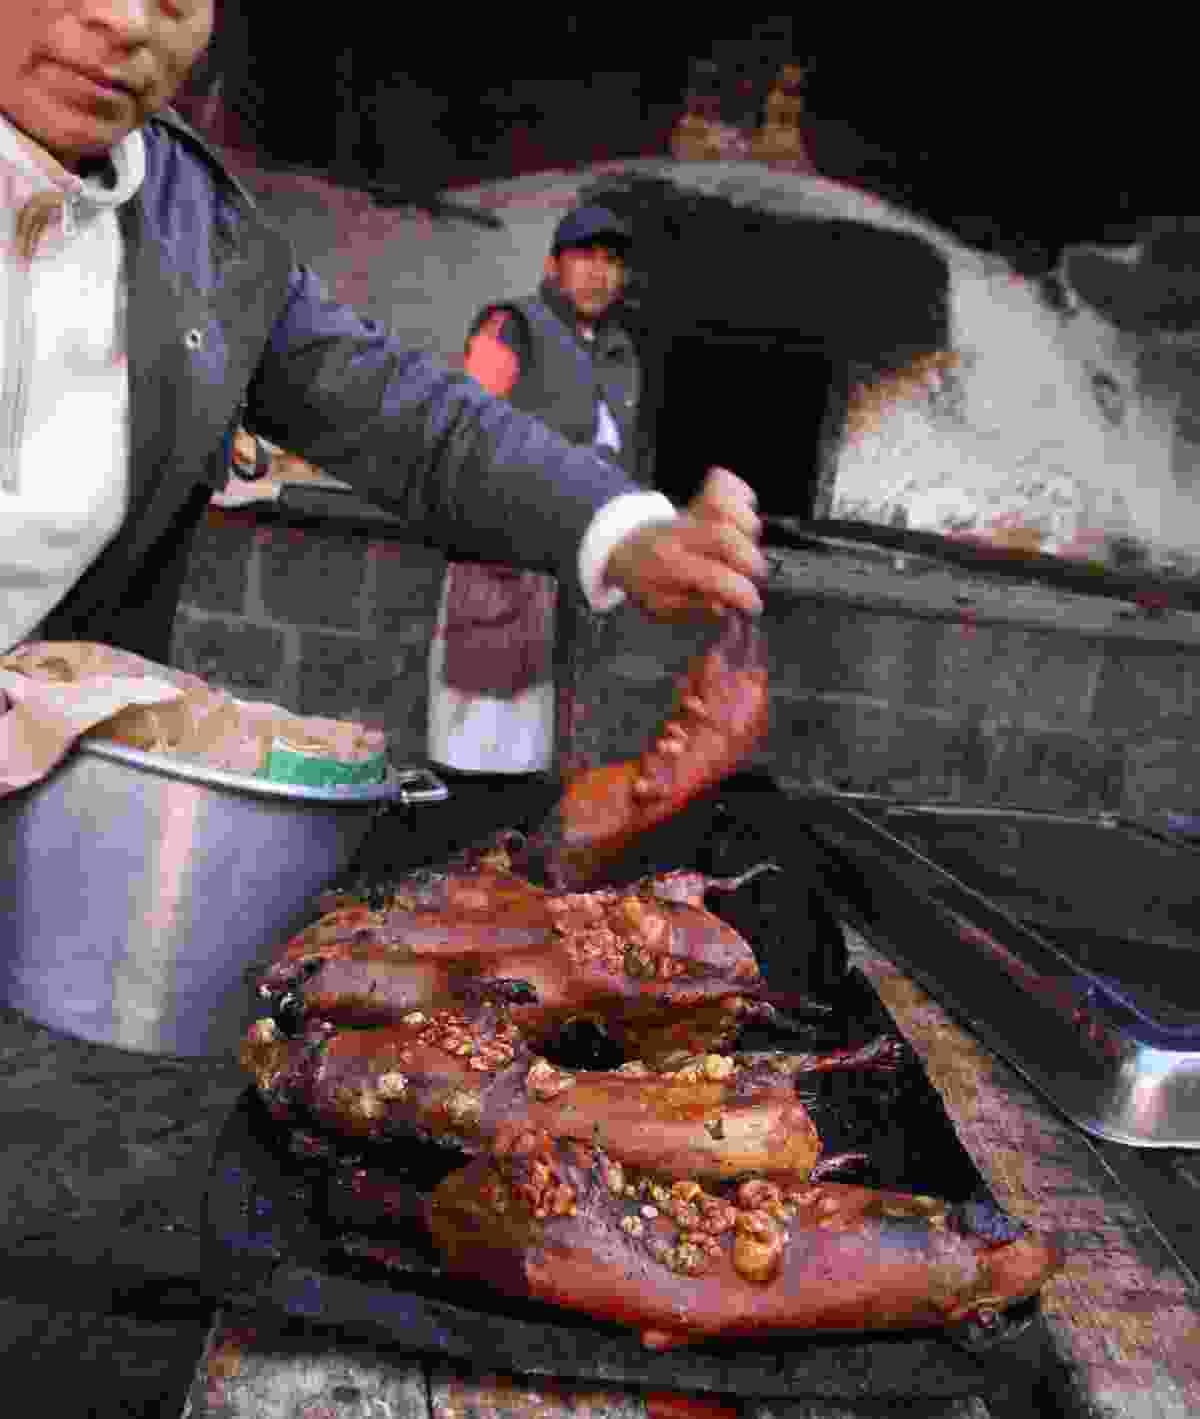 A pachamanca feast takes a fair bit of effort to prepare (Paul Bloomfield)